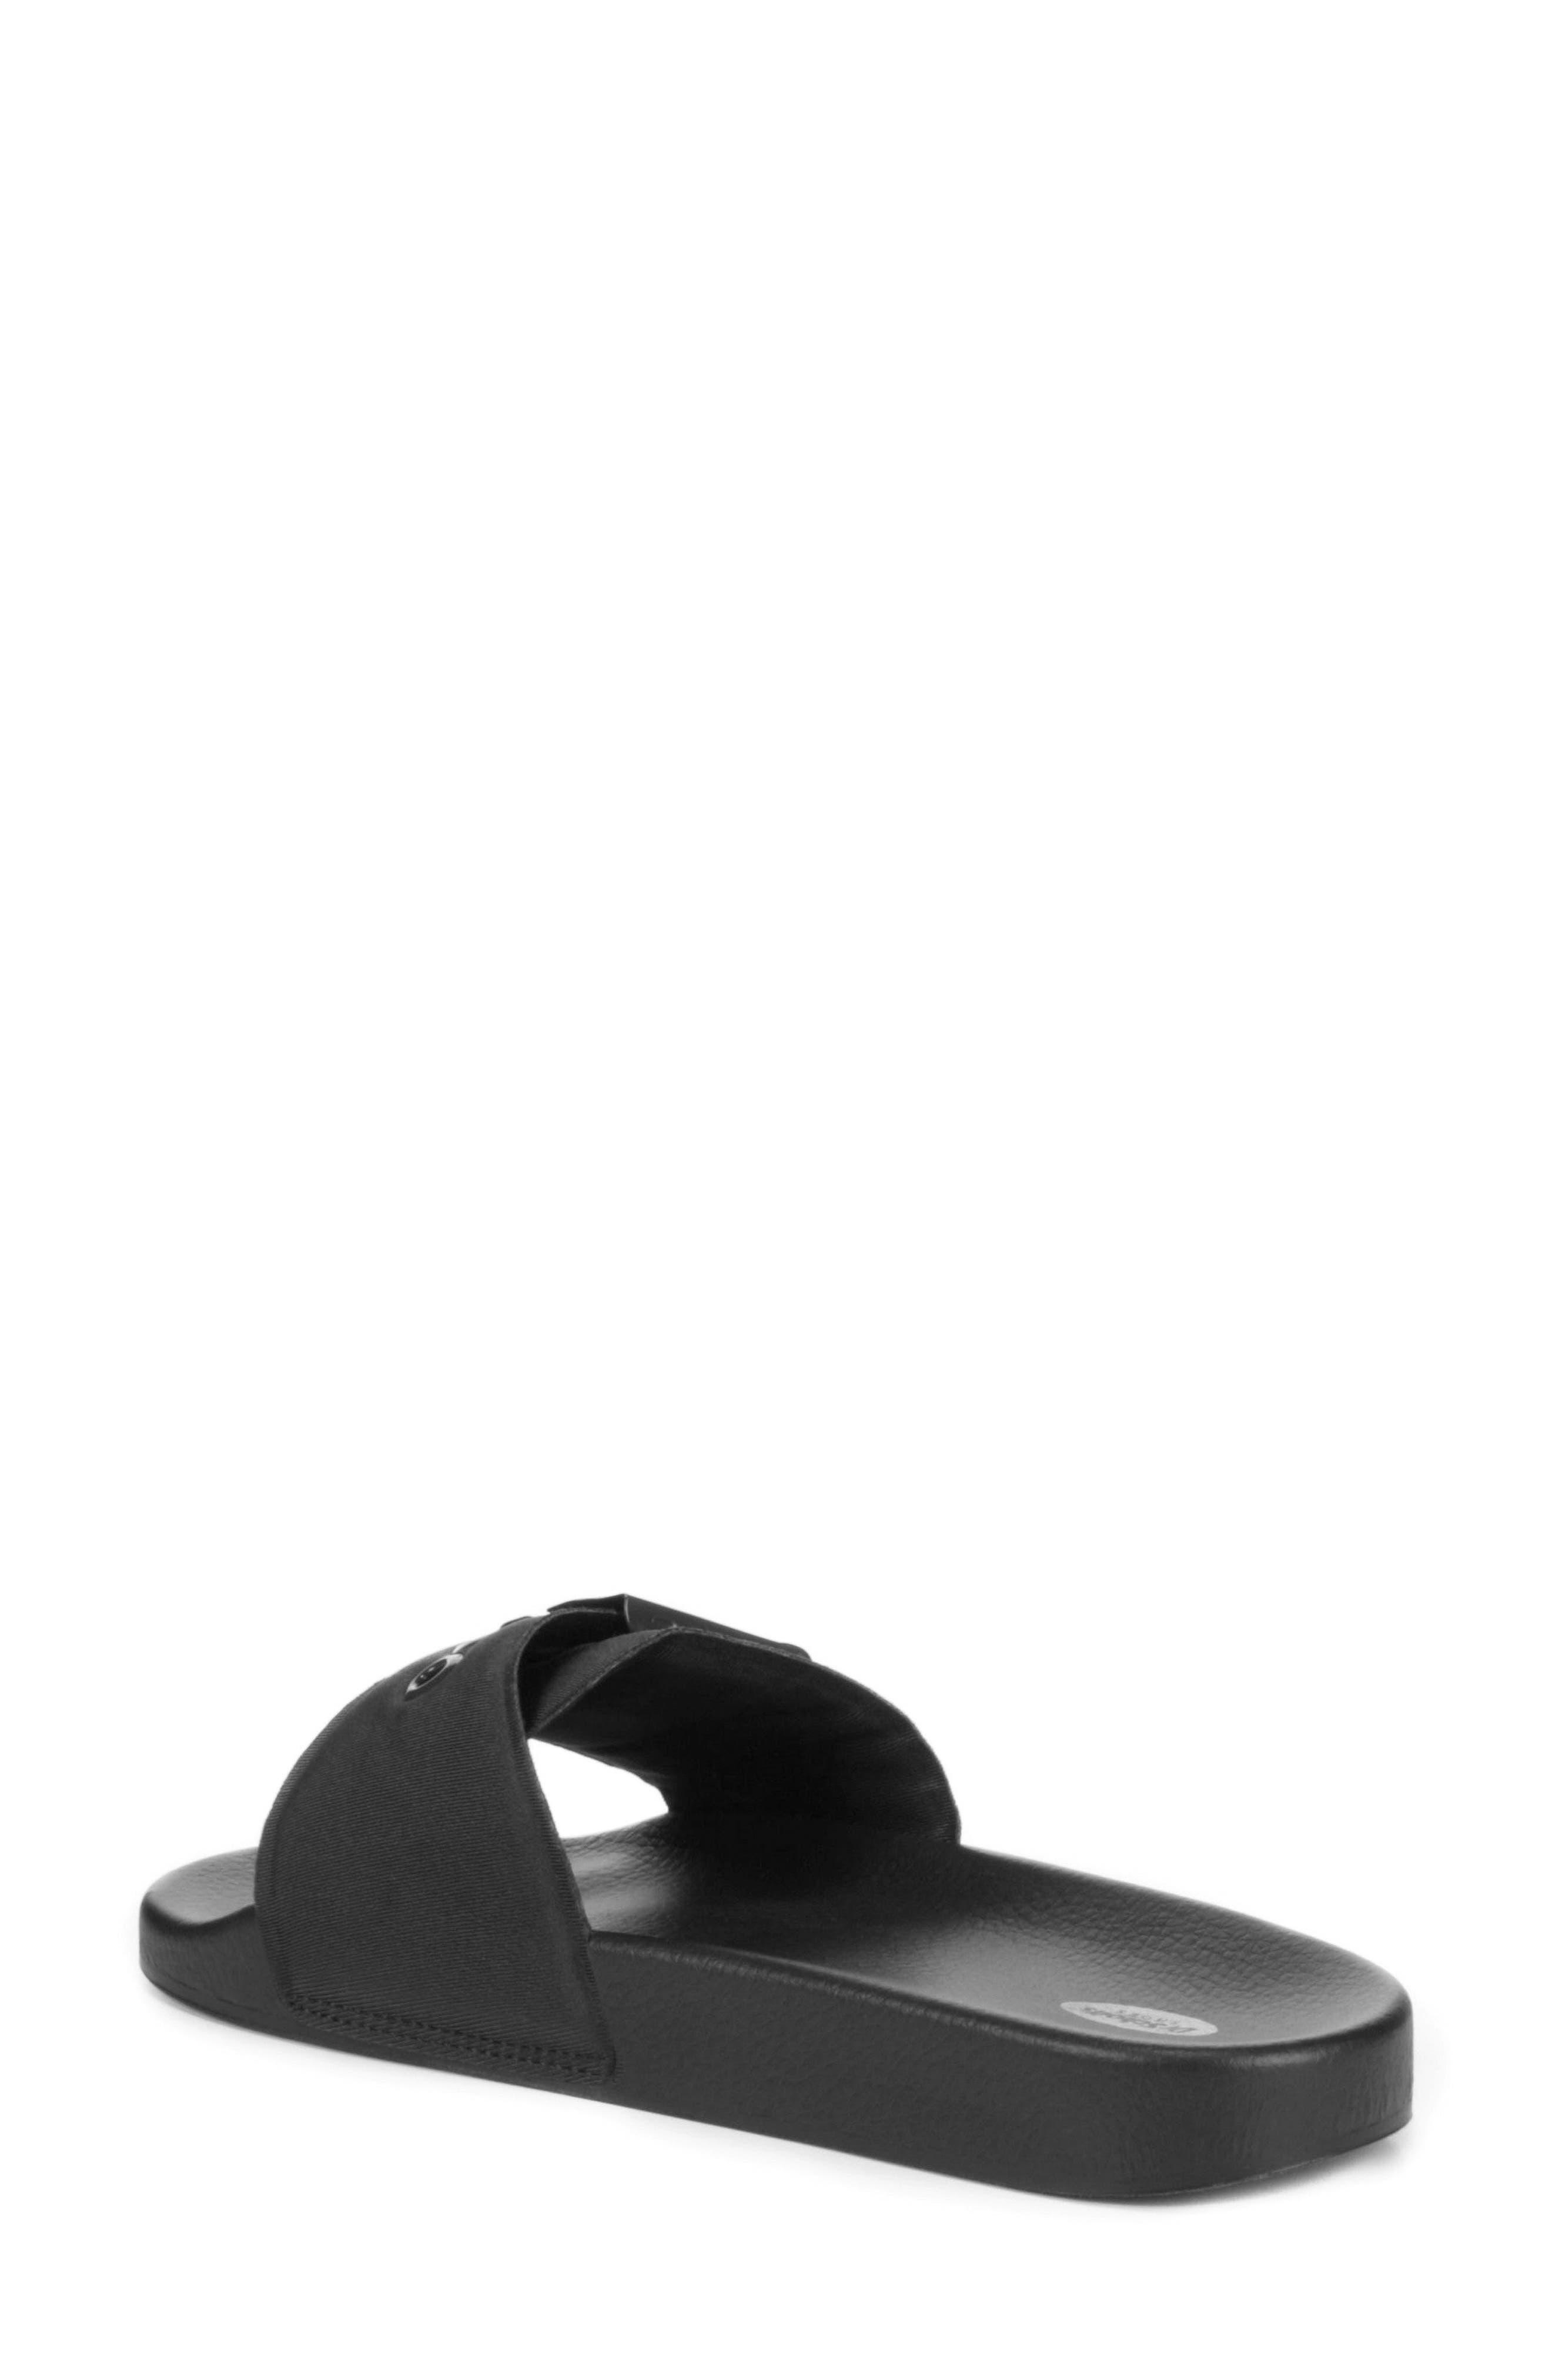 DR. SCHOLL'S, Original Pool Slide Sandal, Alternate thumbnail 2, color, 001